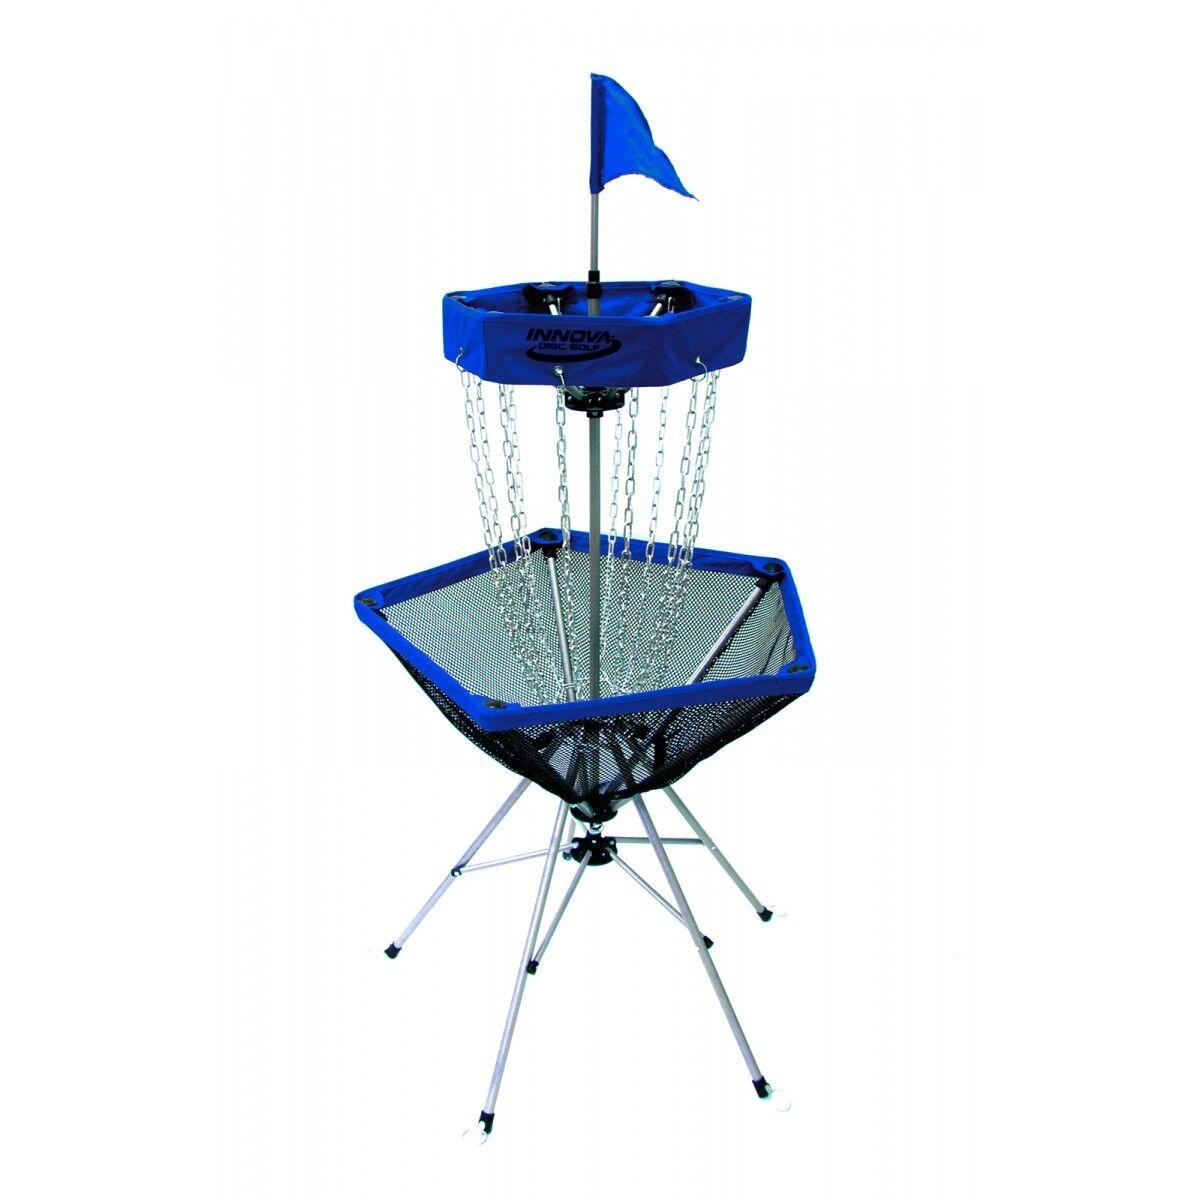 NEW - Innova DISCatcher Traveler Disc Golf Basket - NEW Blau 911b2f